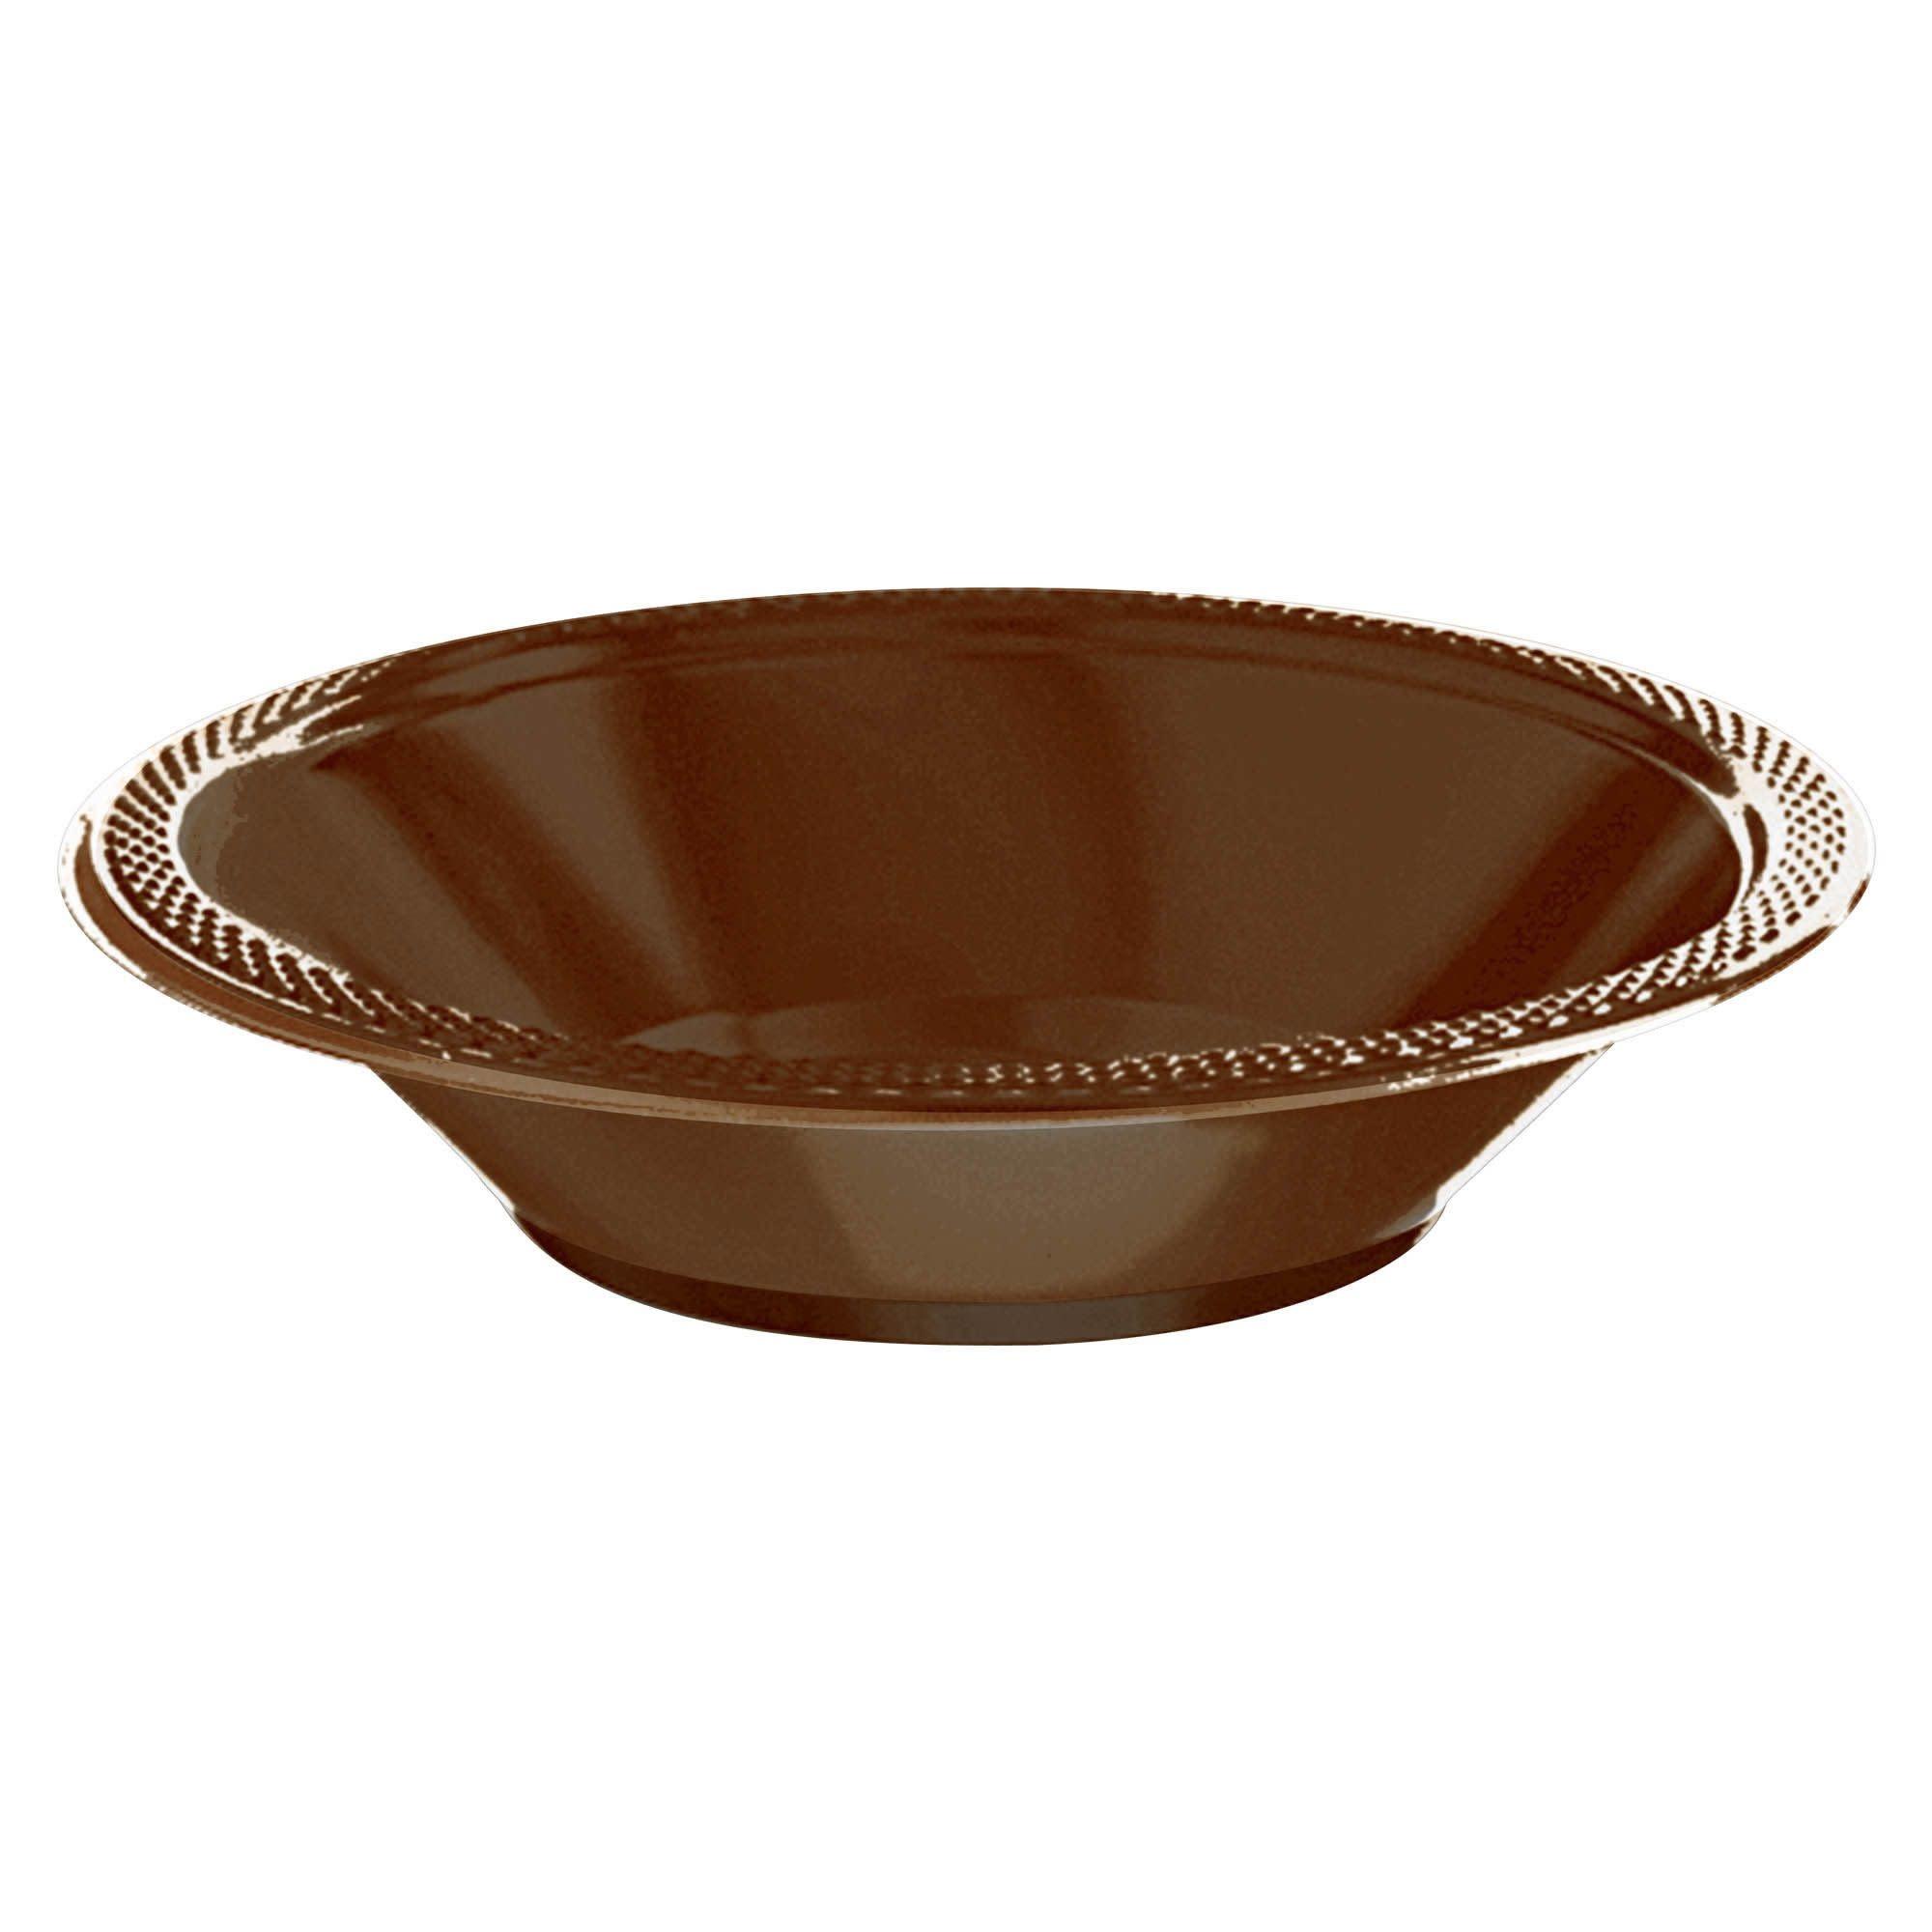 Chocolate Brown Plastic Bowls, 12oz.